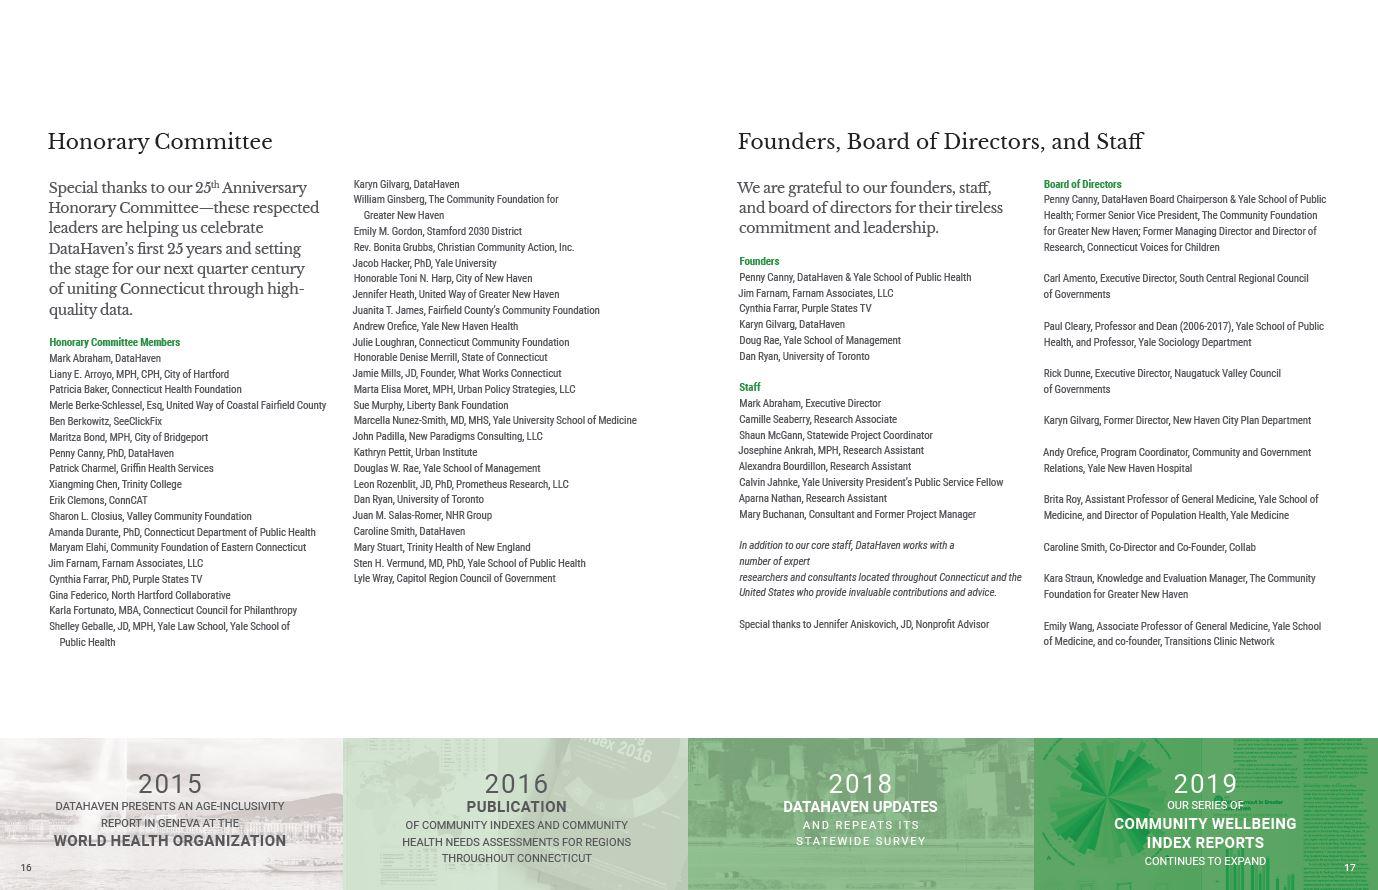 DataHaven 25th Anniversary honorary committee and board